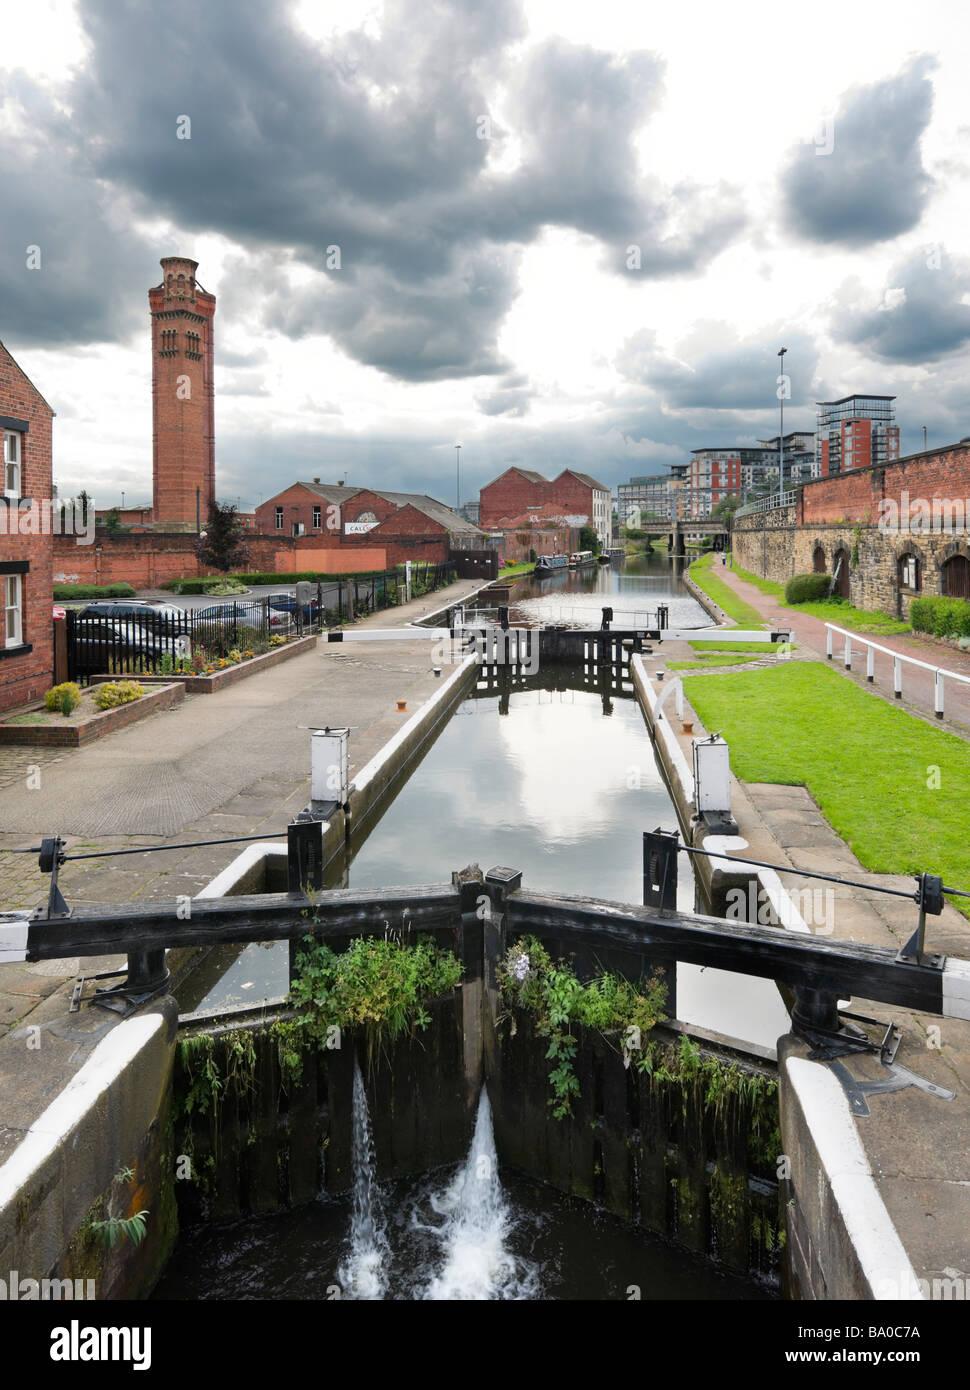 Lock on the Leeds Liverpool Canal near Granary Wharf, Leeds, West Yorkshire, England - Stock Image